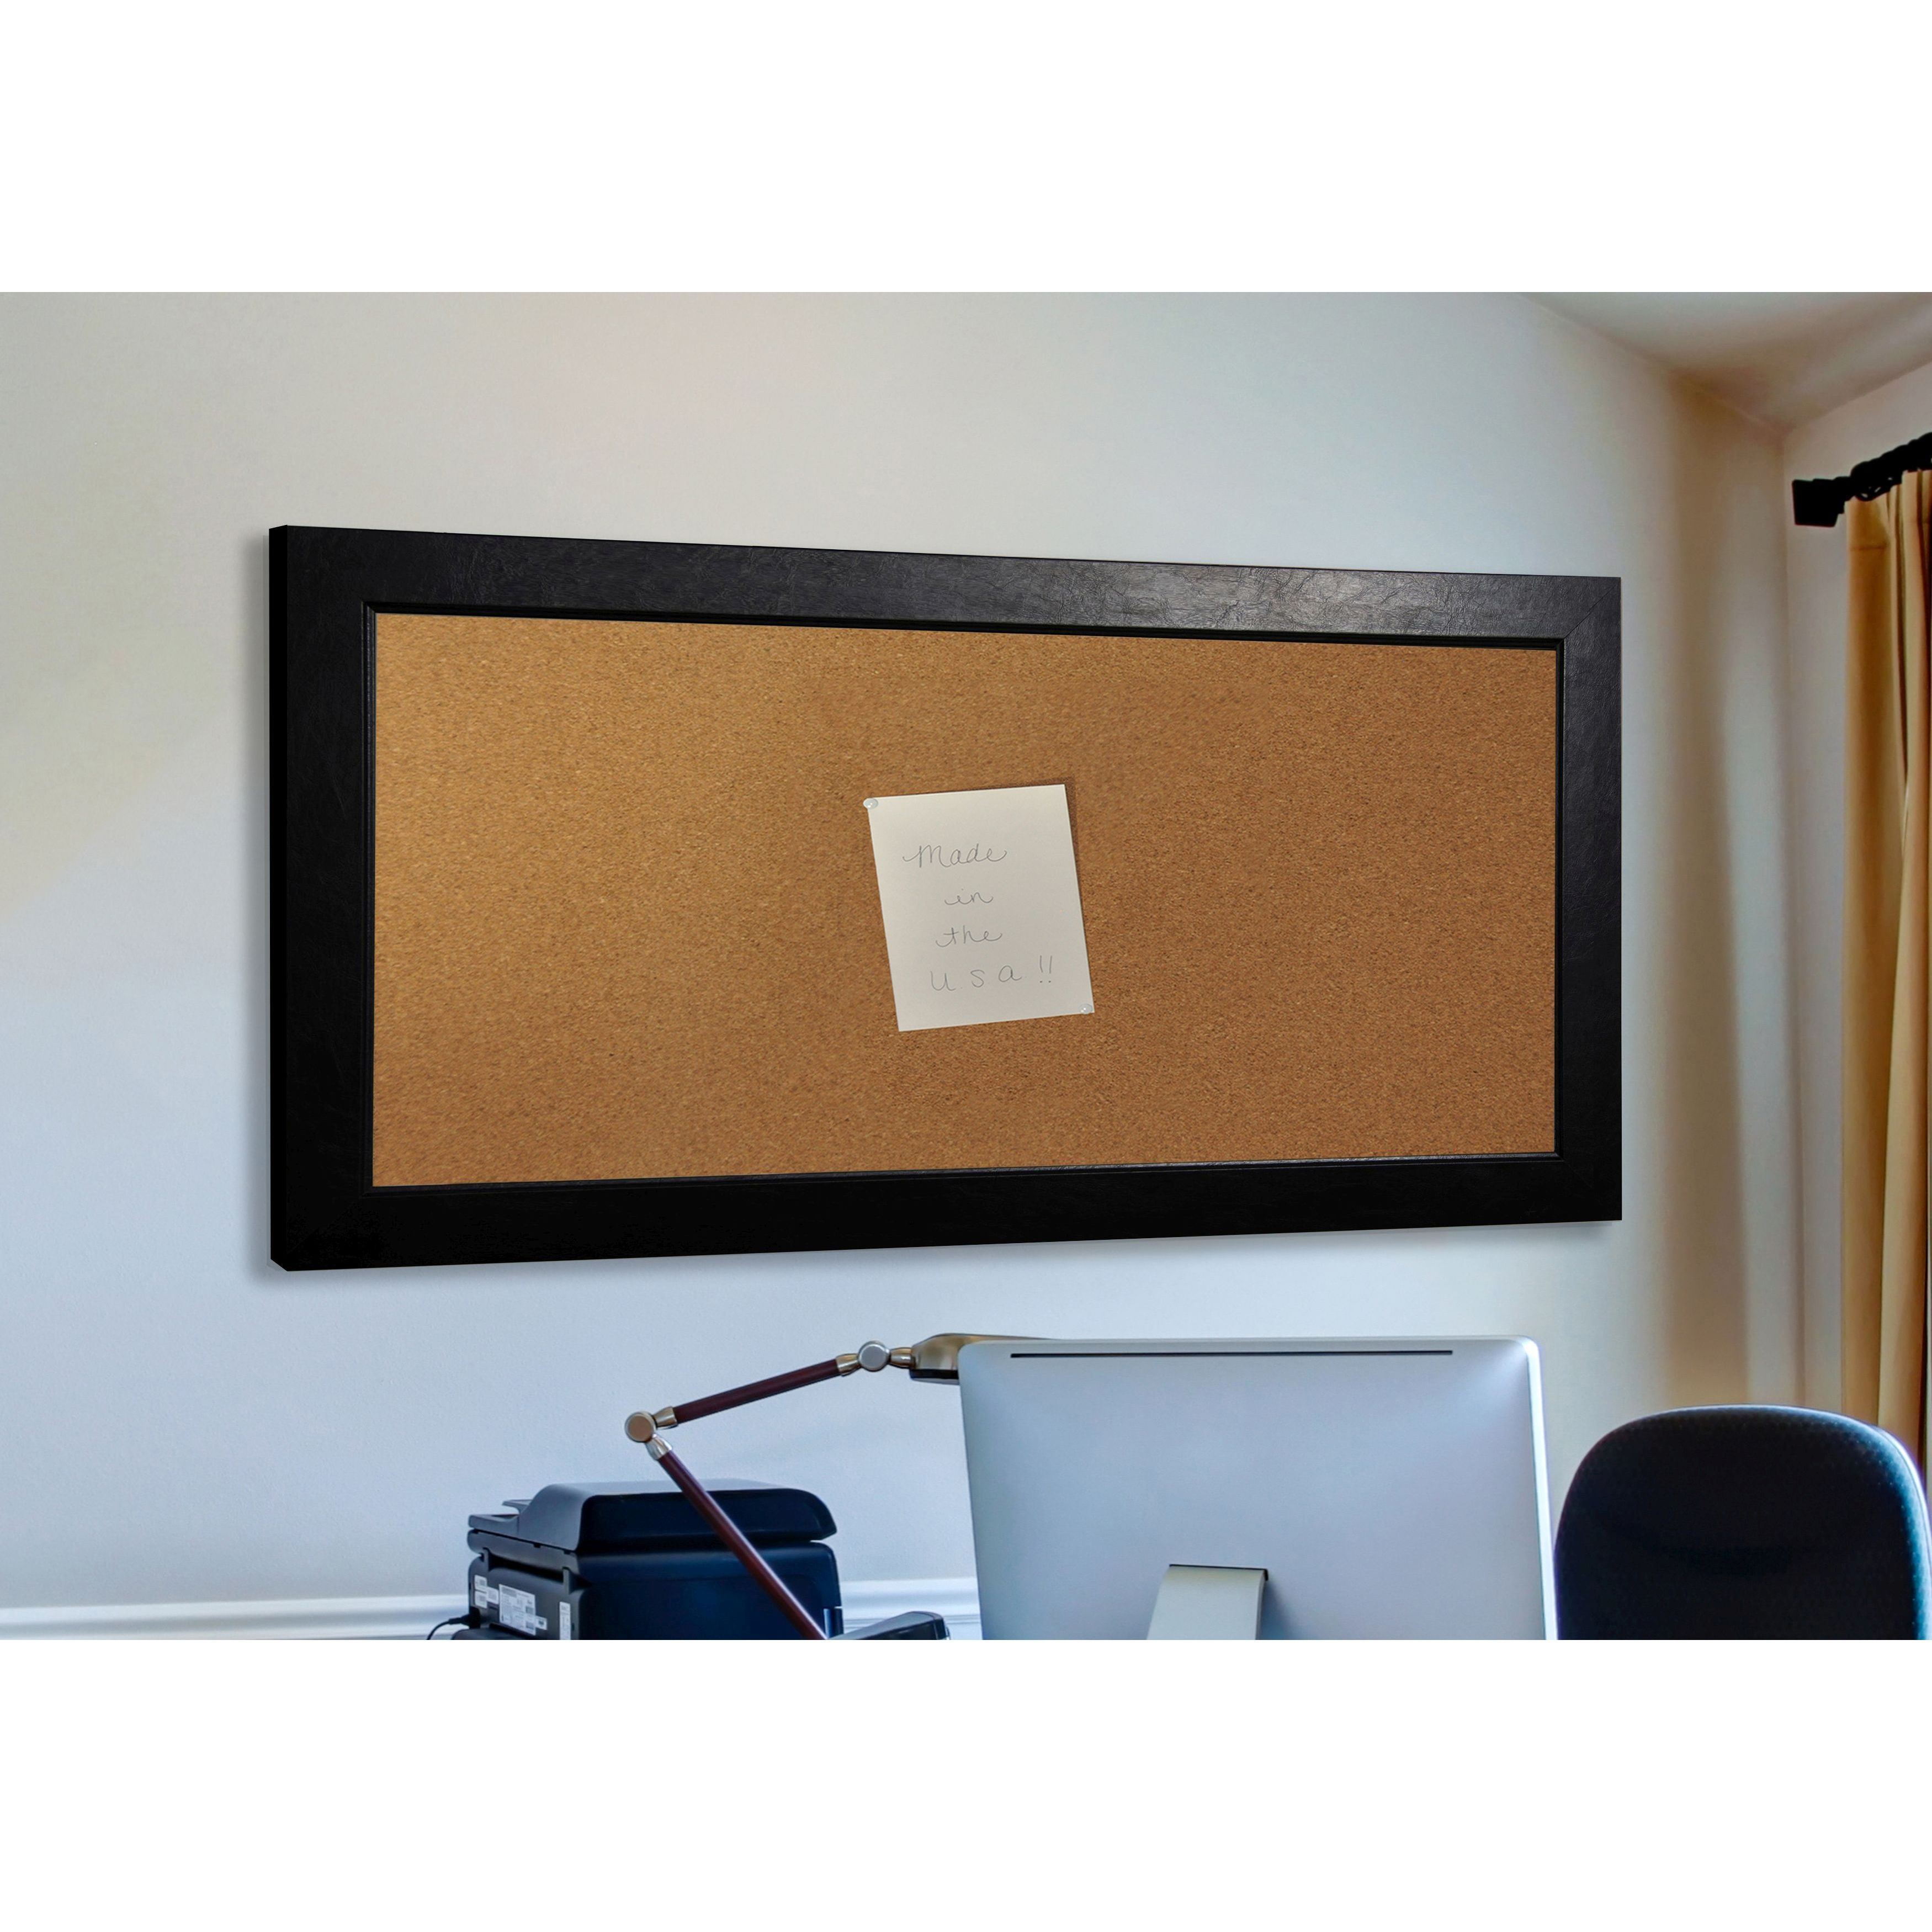 Rayne Mirrors Madilyn Nichole Superior Wall Mounted Bulletin Board